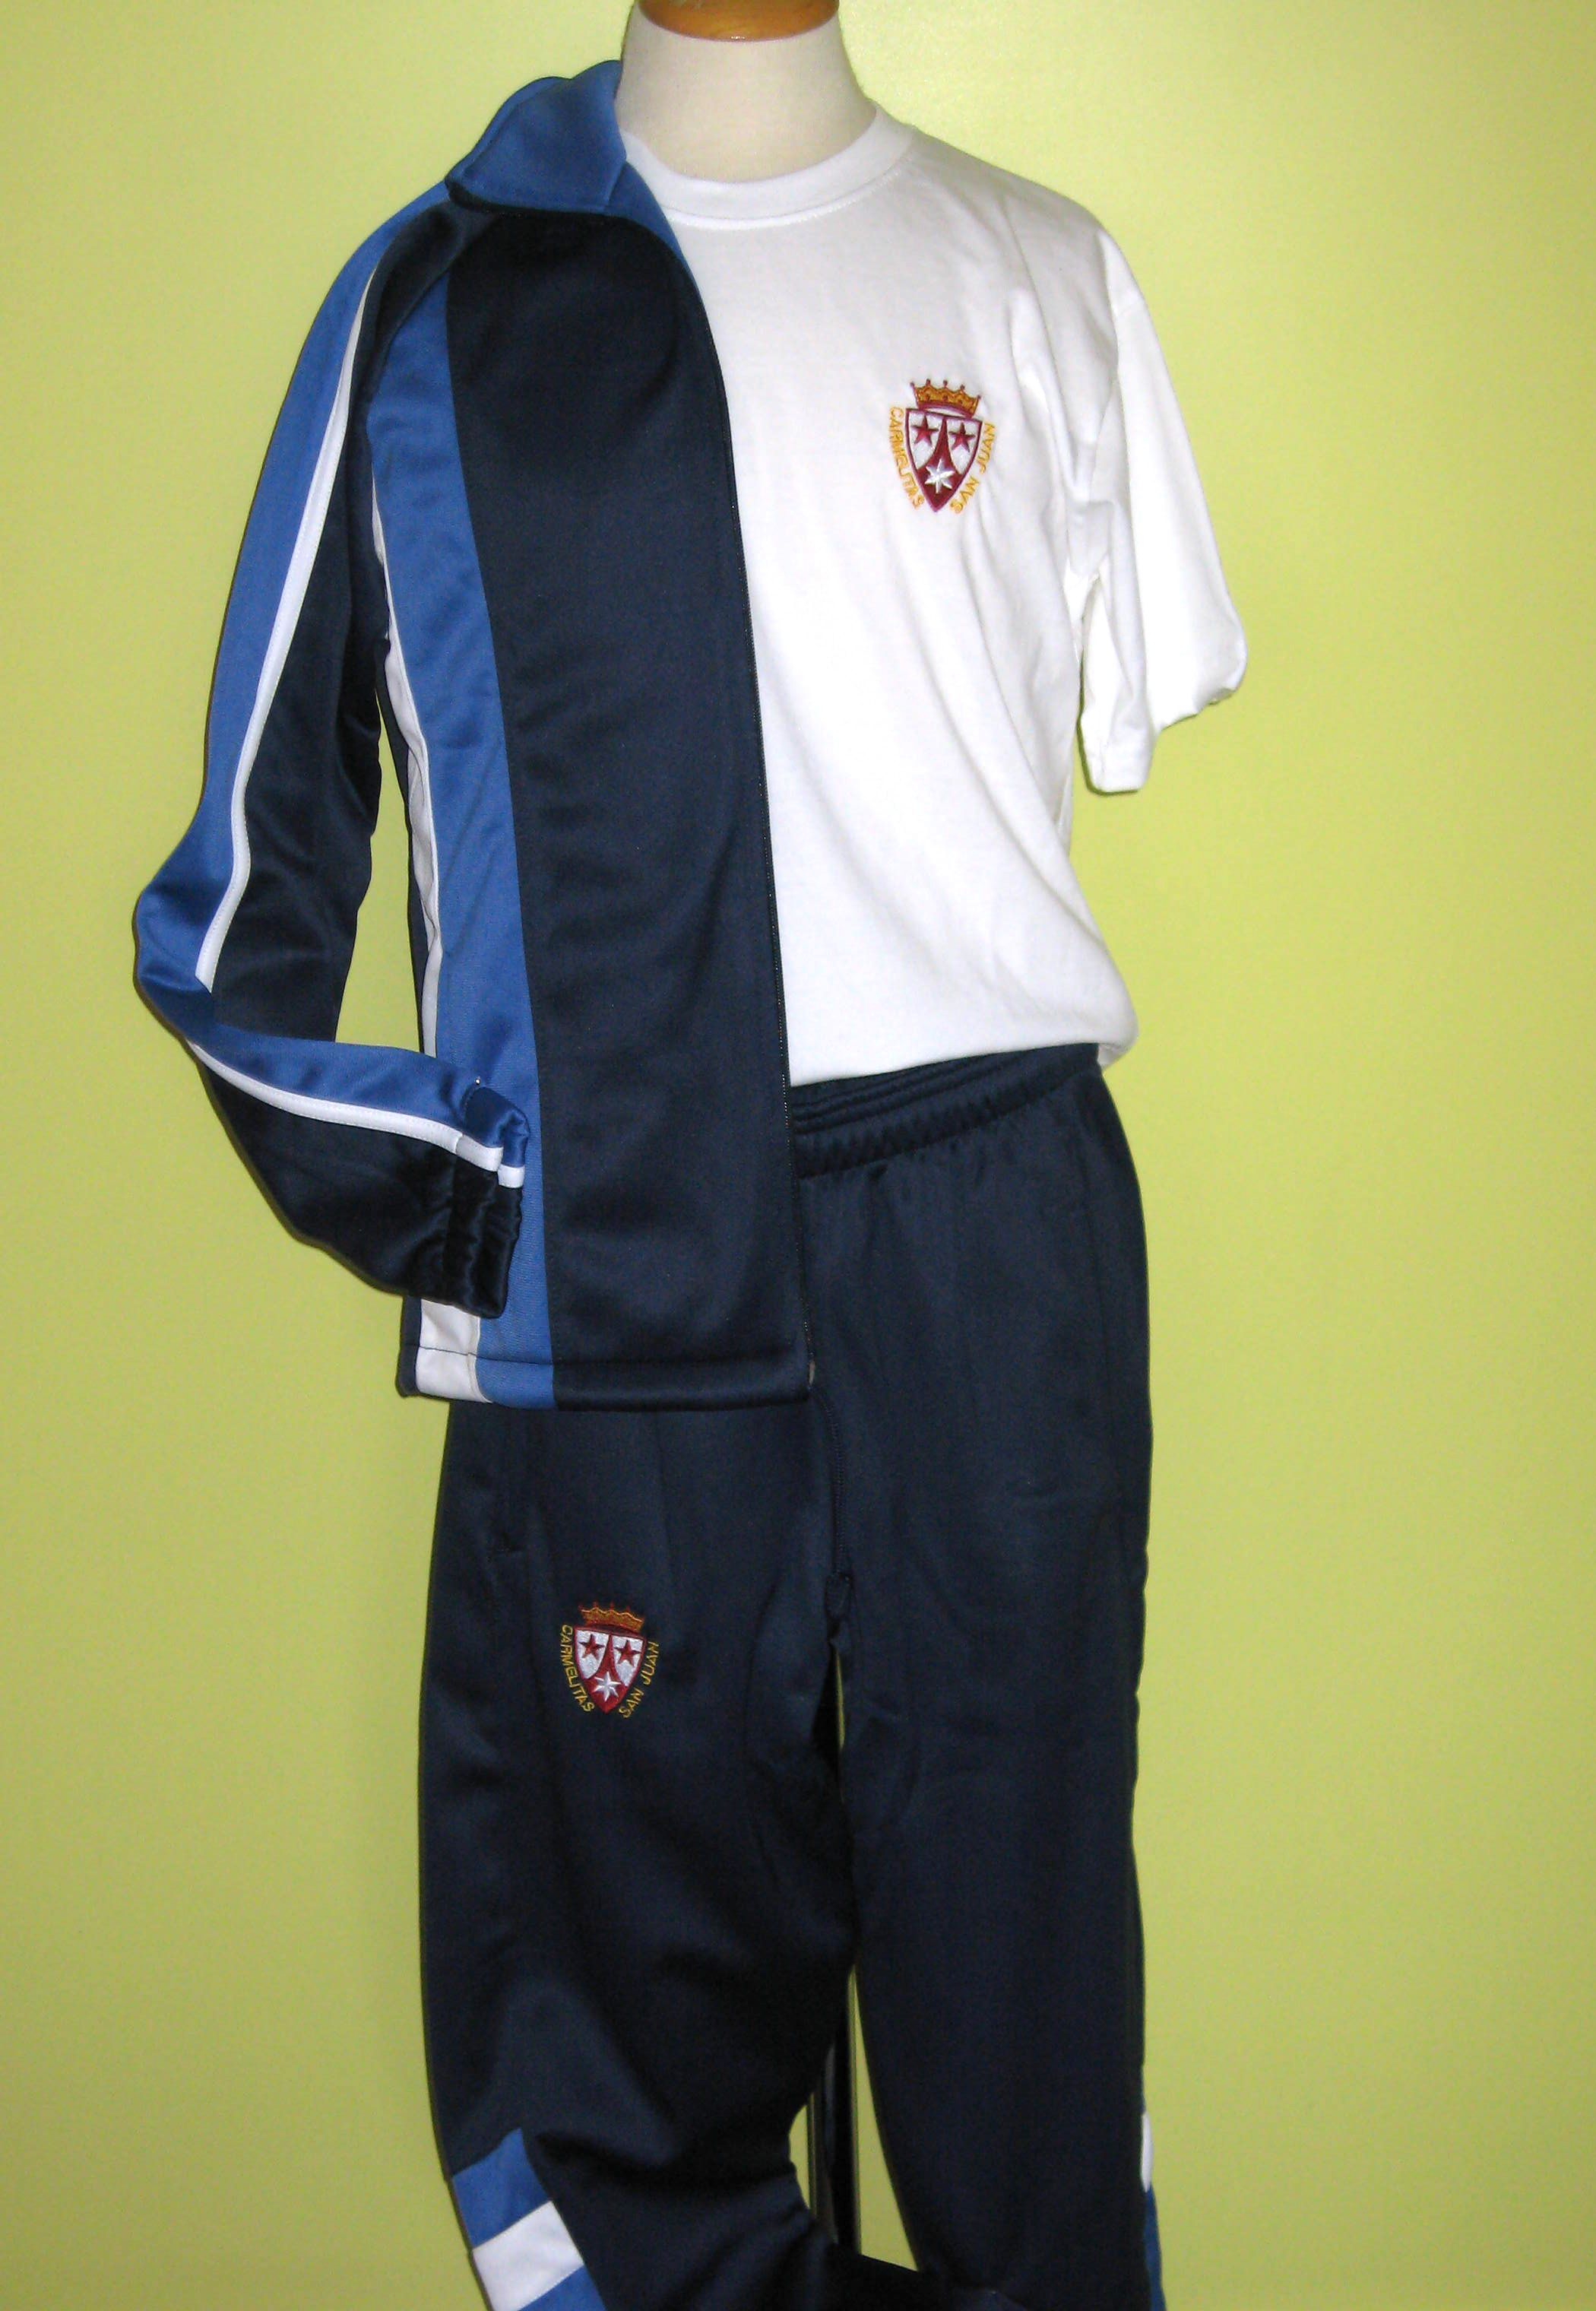 Uniforme deportivo San Juan Carmelitas pantalón y chaqueta ... dd3ad78b82fbd